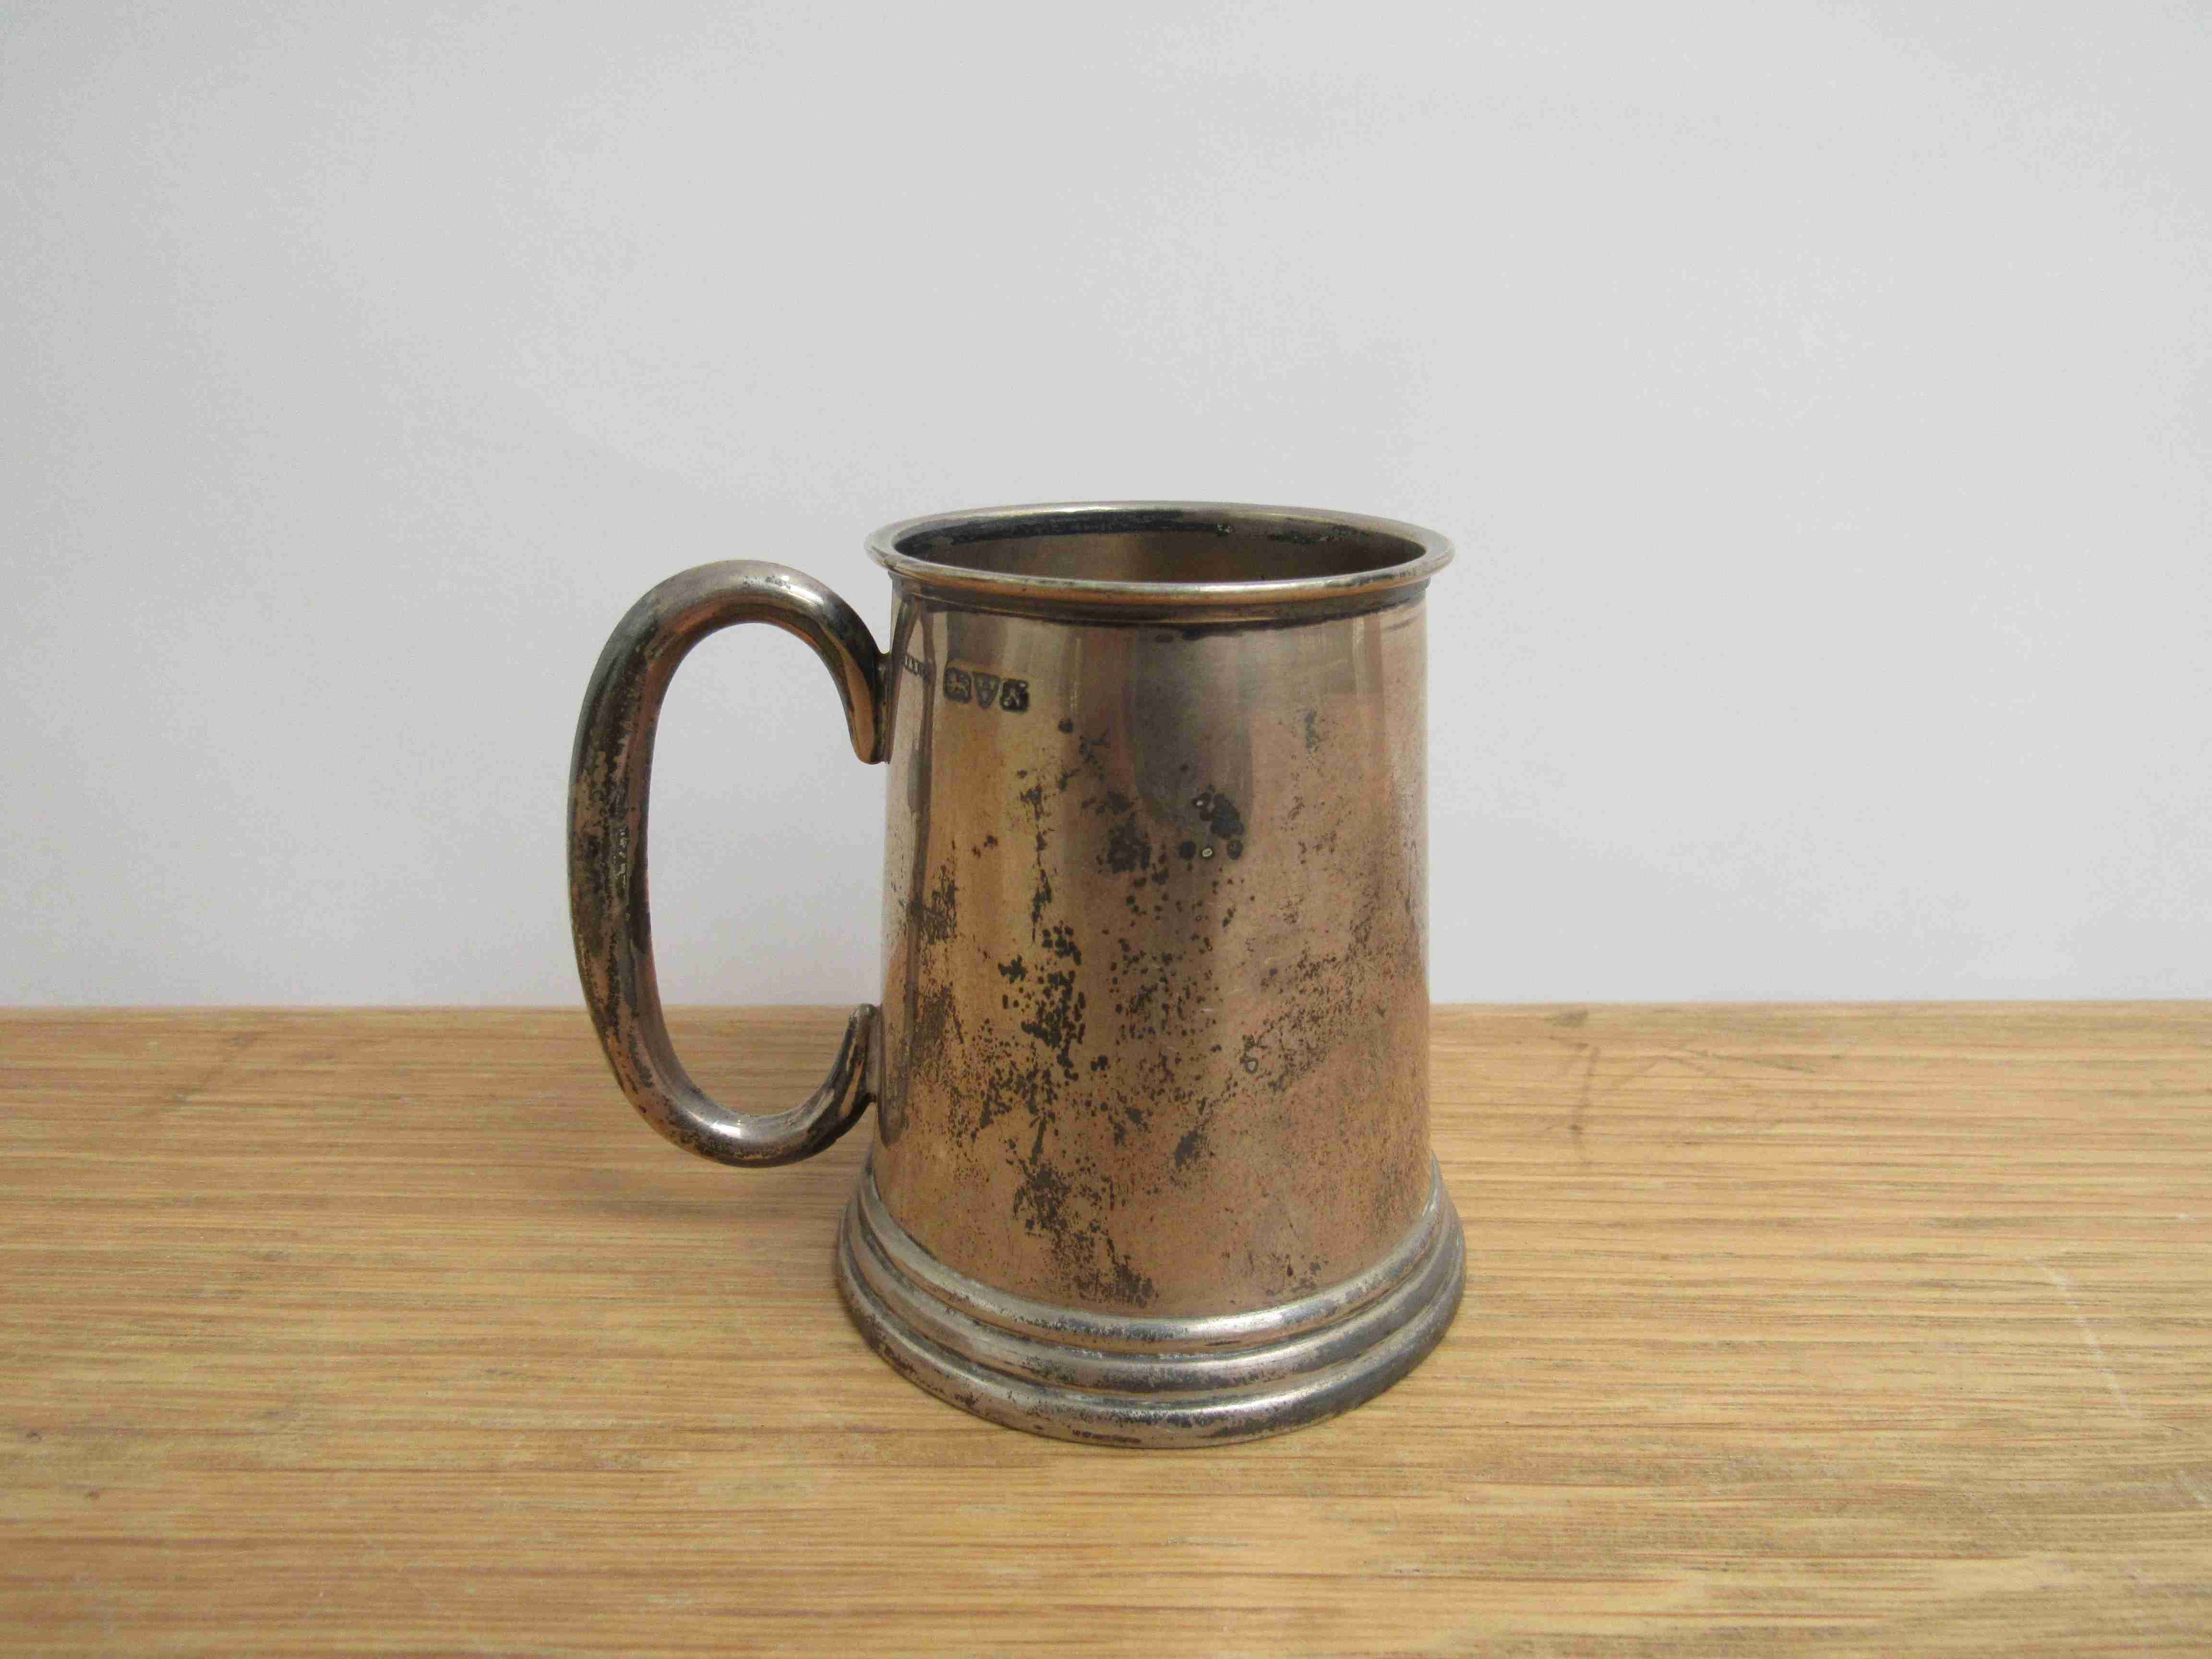 Lot 10 - A S Blanckensee and Son Ltd silver miniature tankard, Chester 1913, 7.